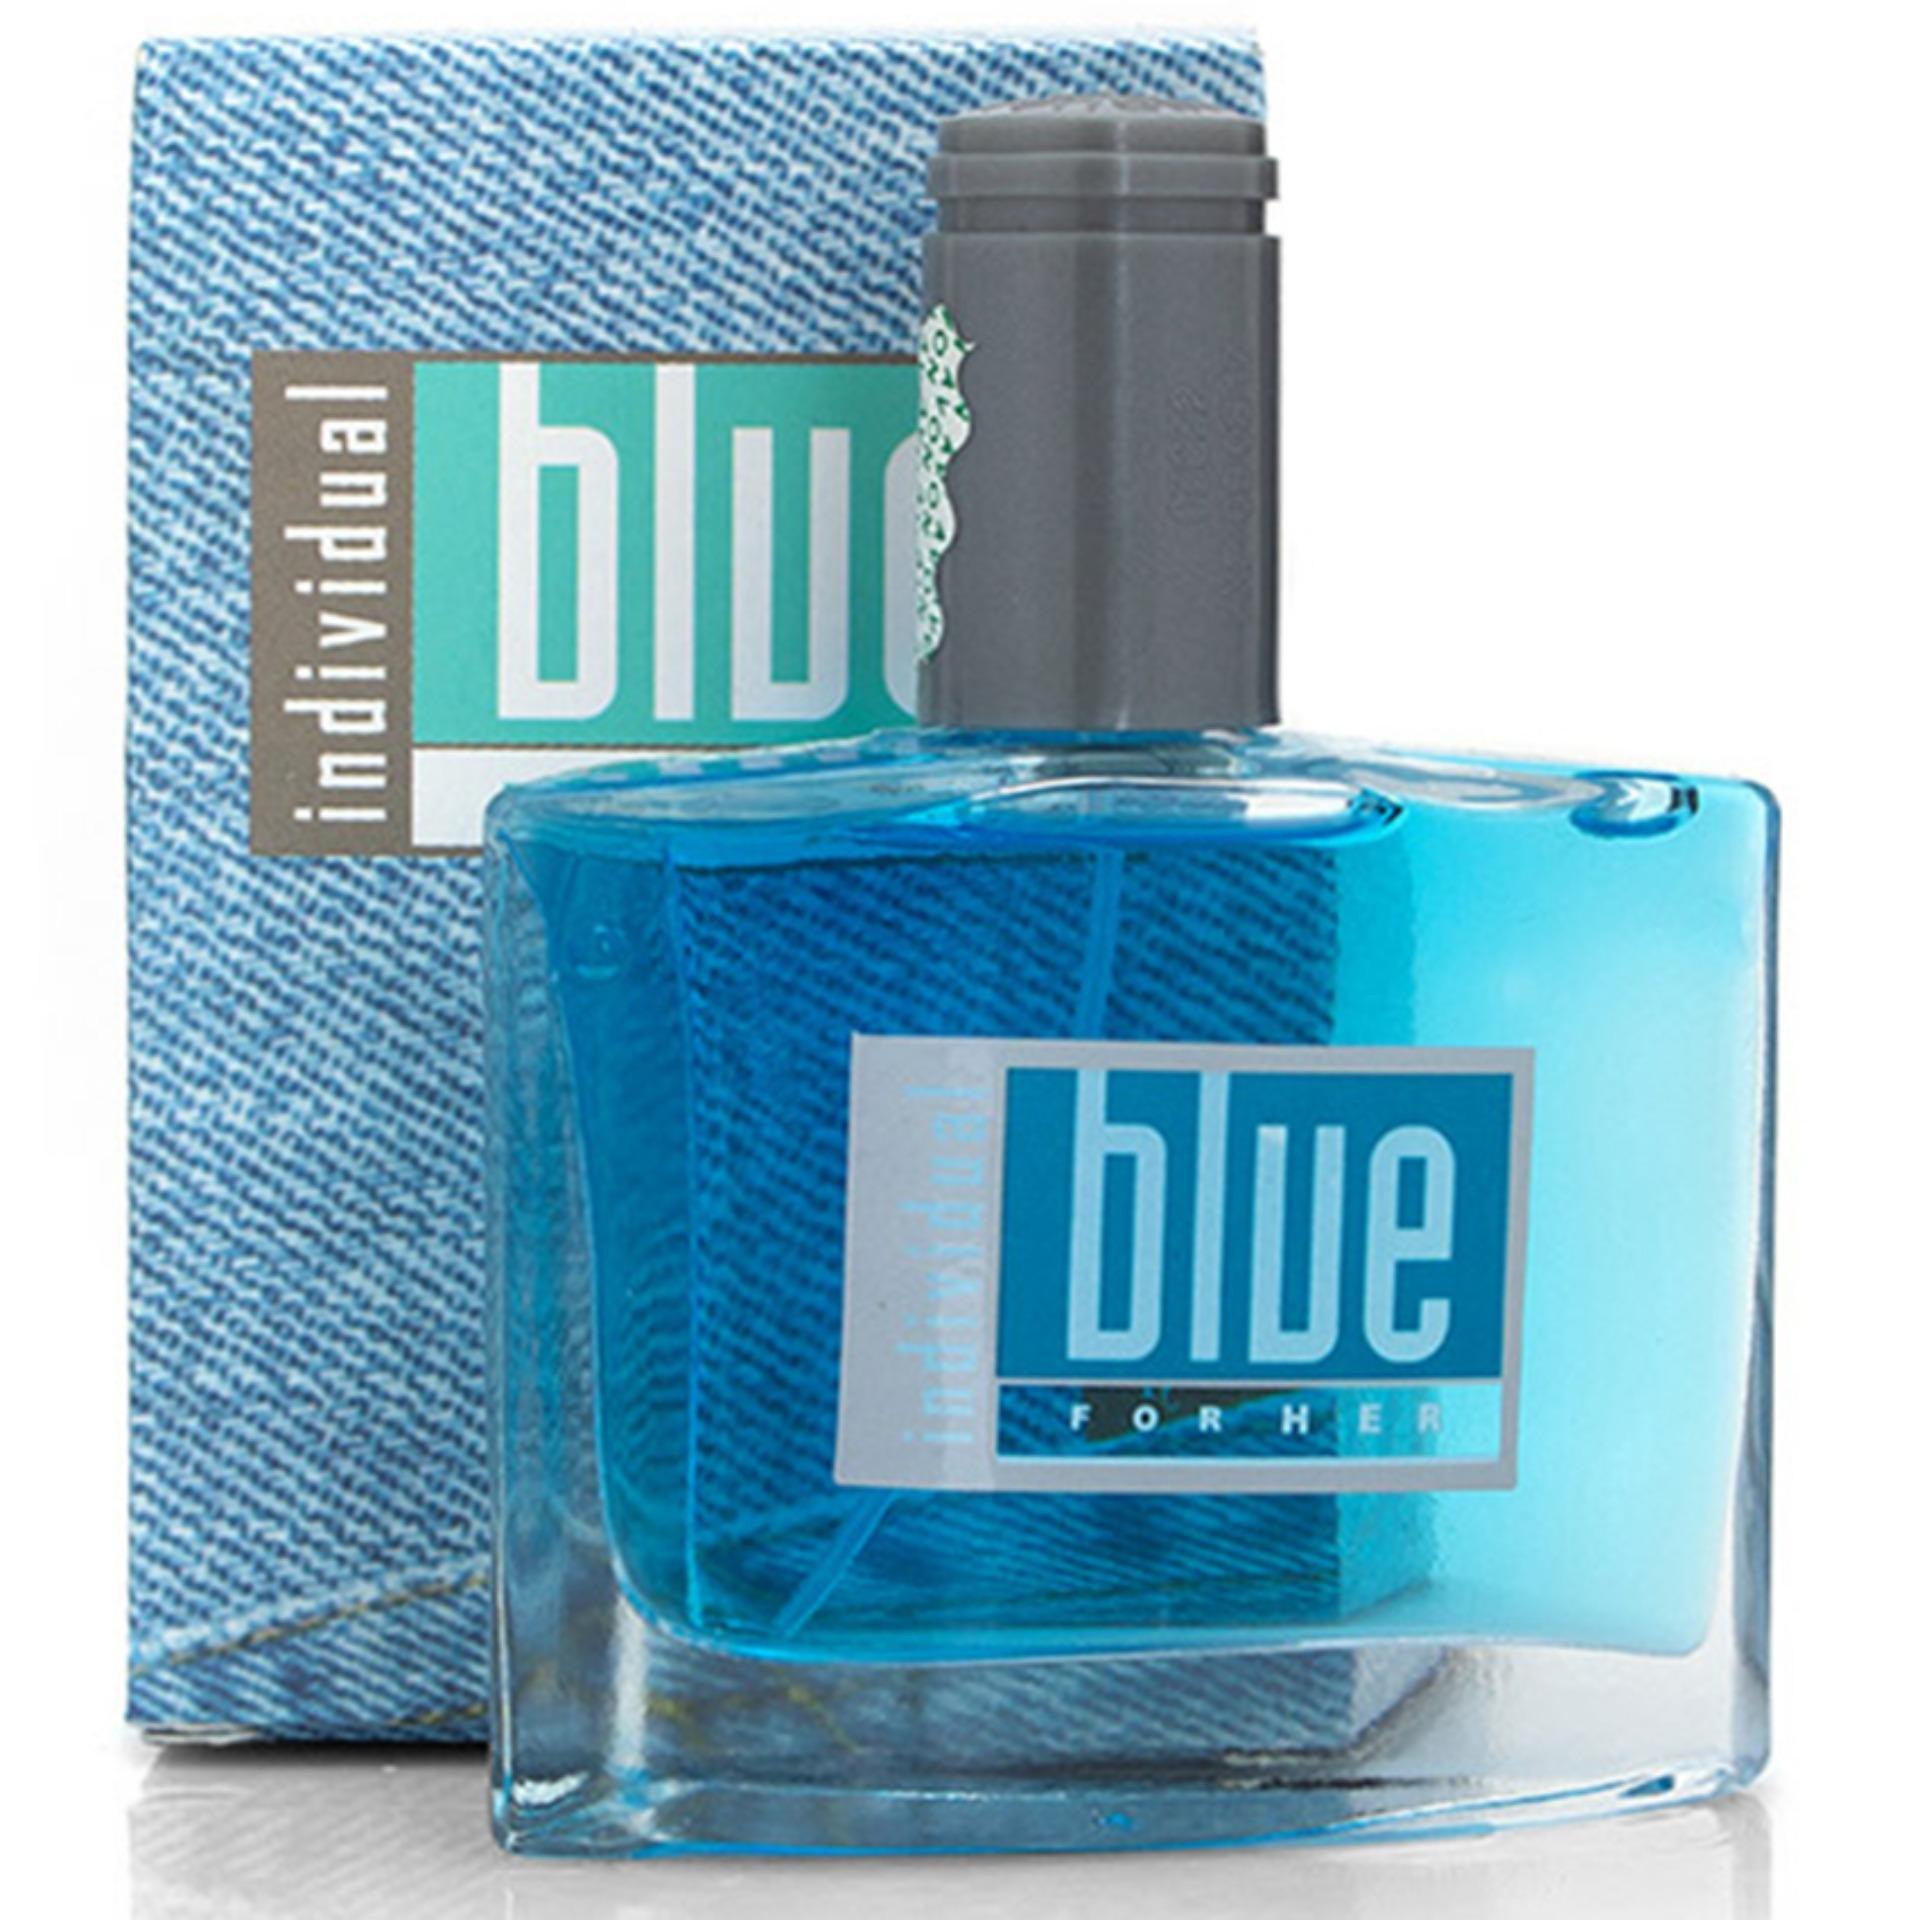 NƯỚC HOA NỮ AVON BLUE FOR HER 50ML